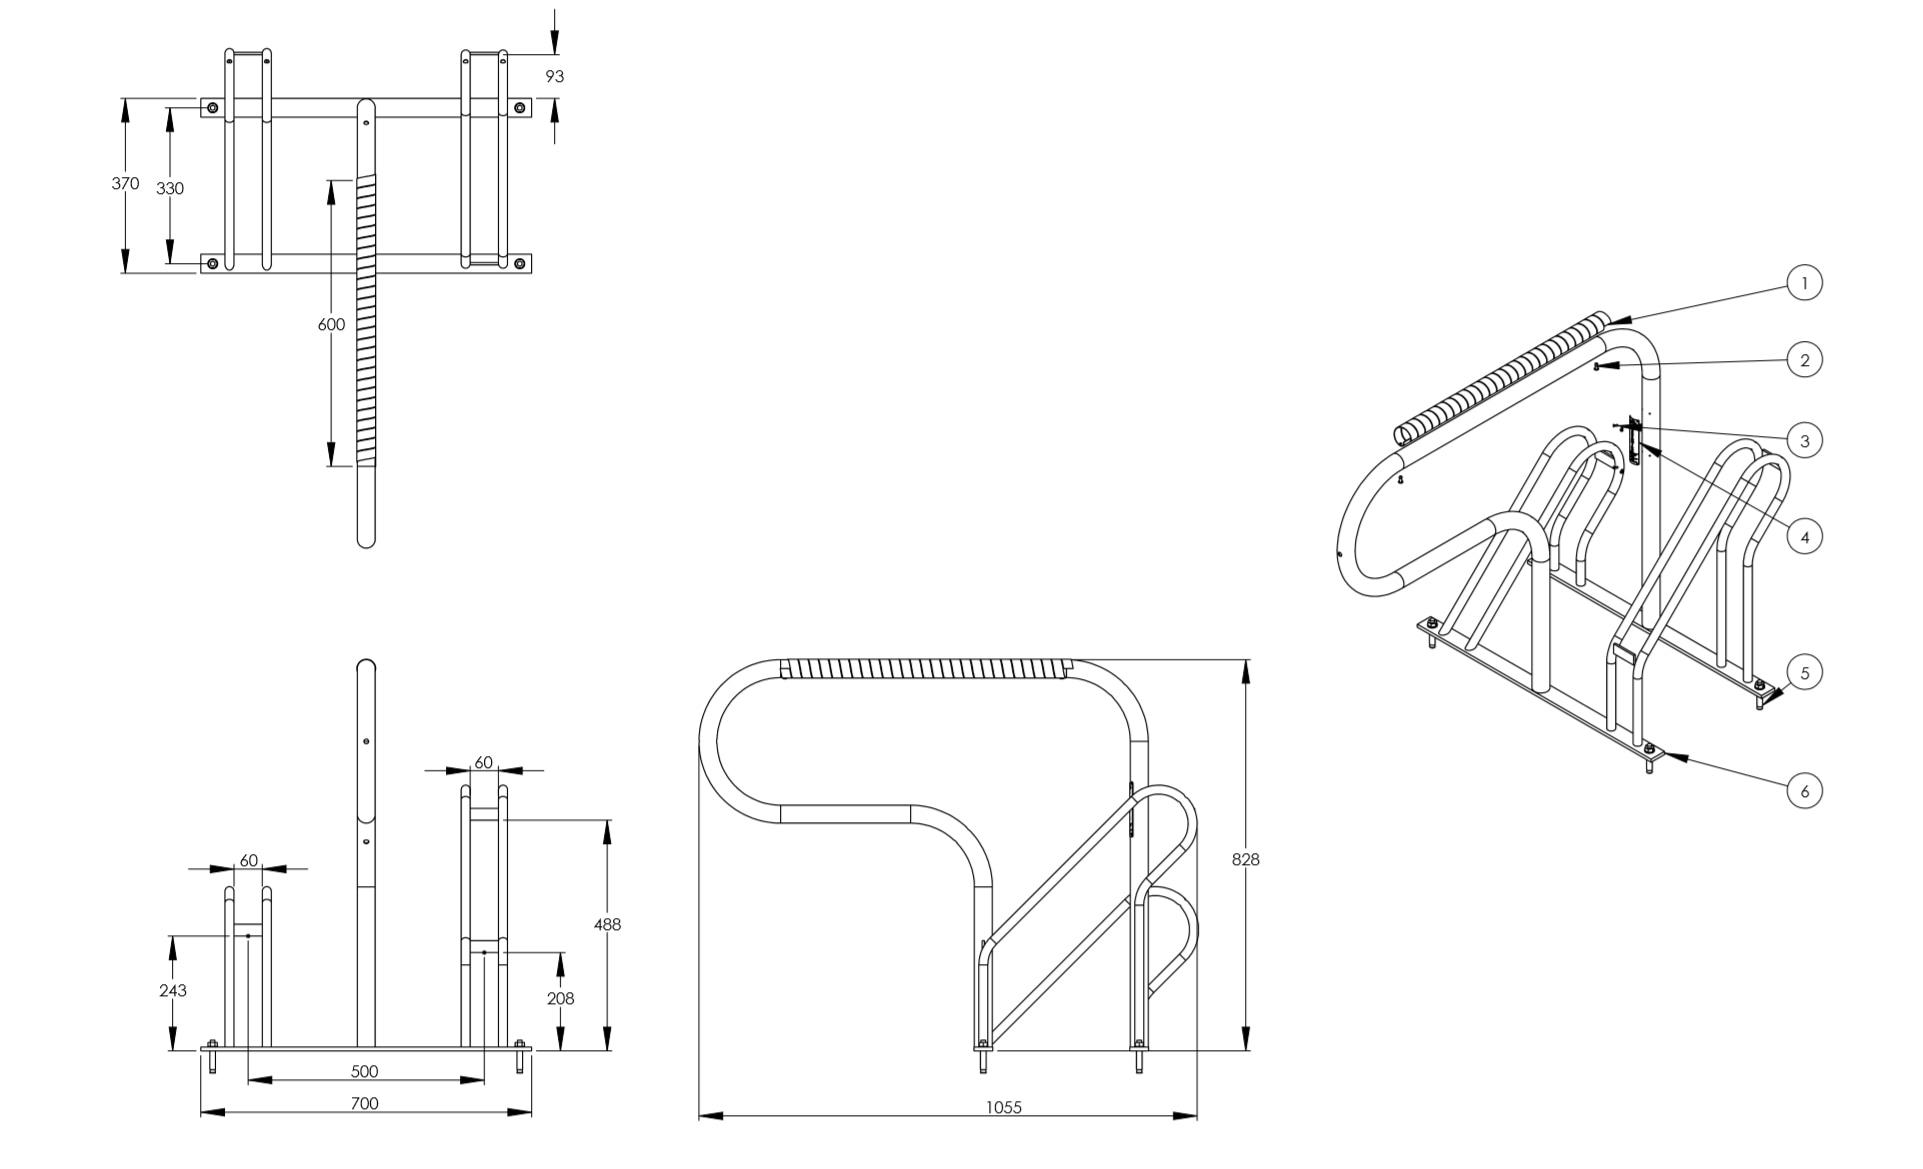 bisiklet park yeri çizimi